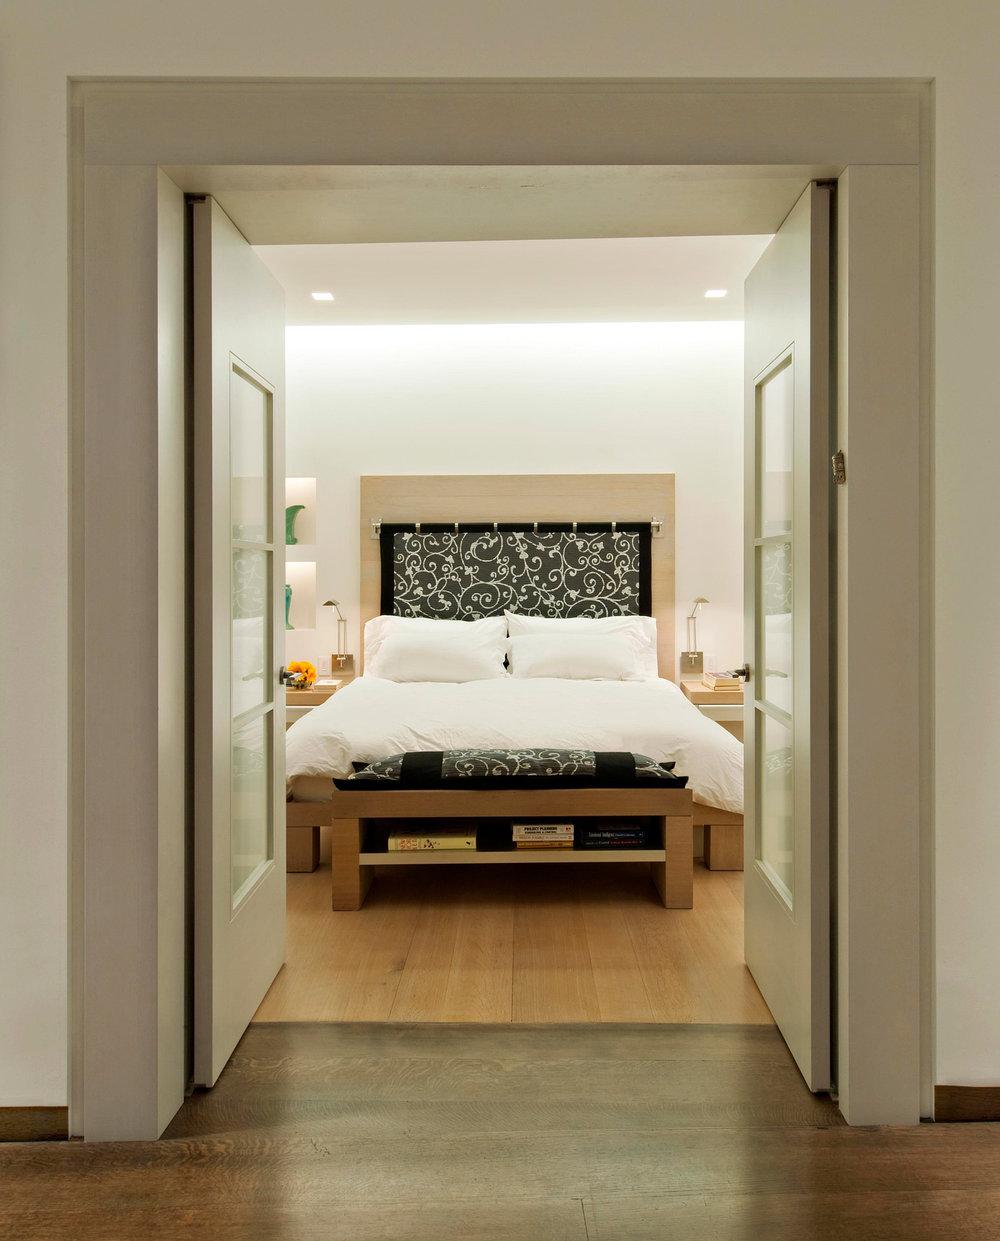 NYC Loft Renovation - View from hallway towards the master bedroom